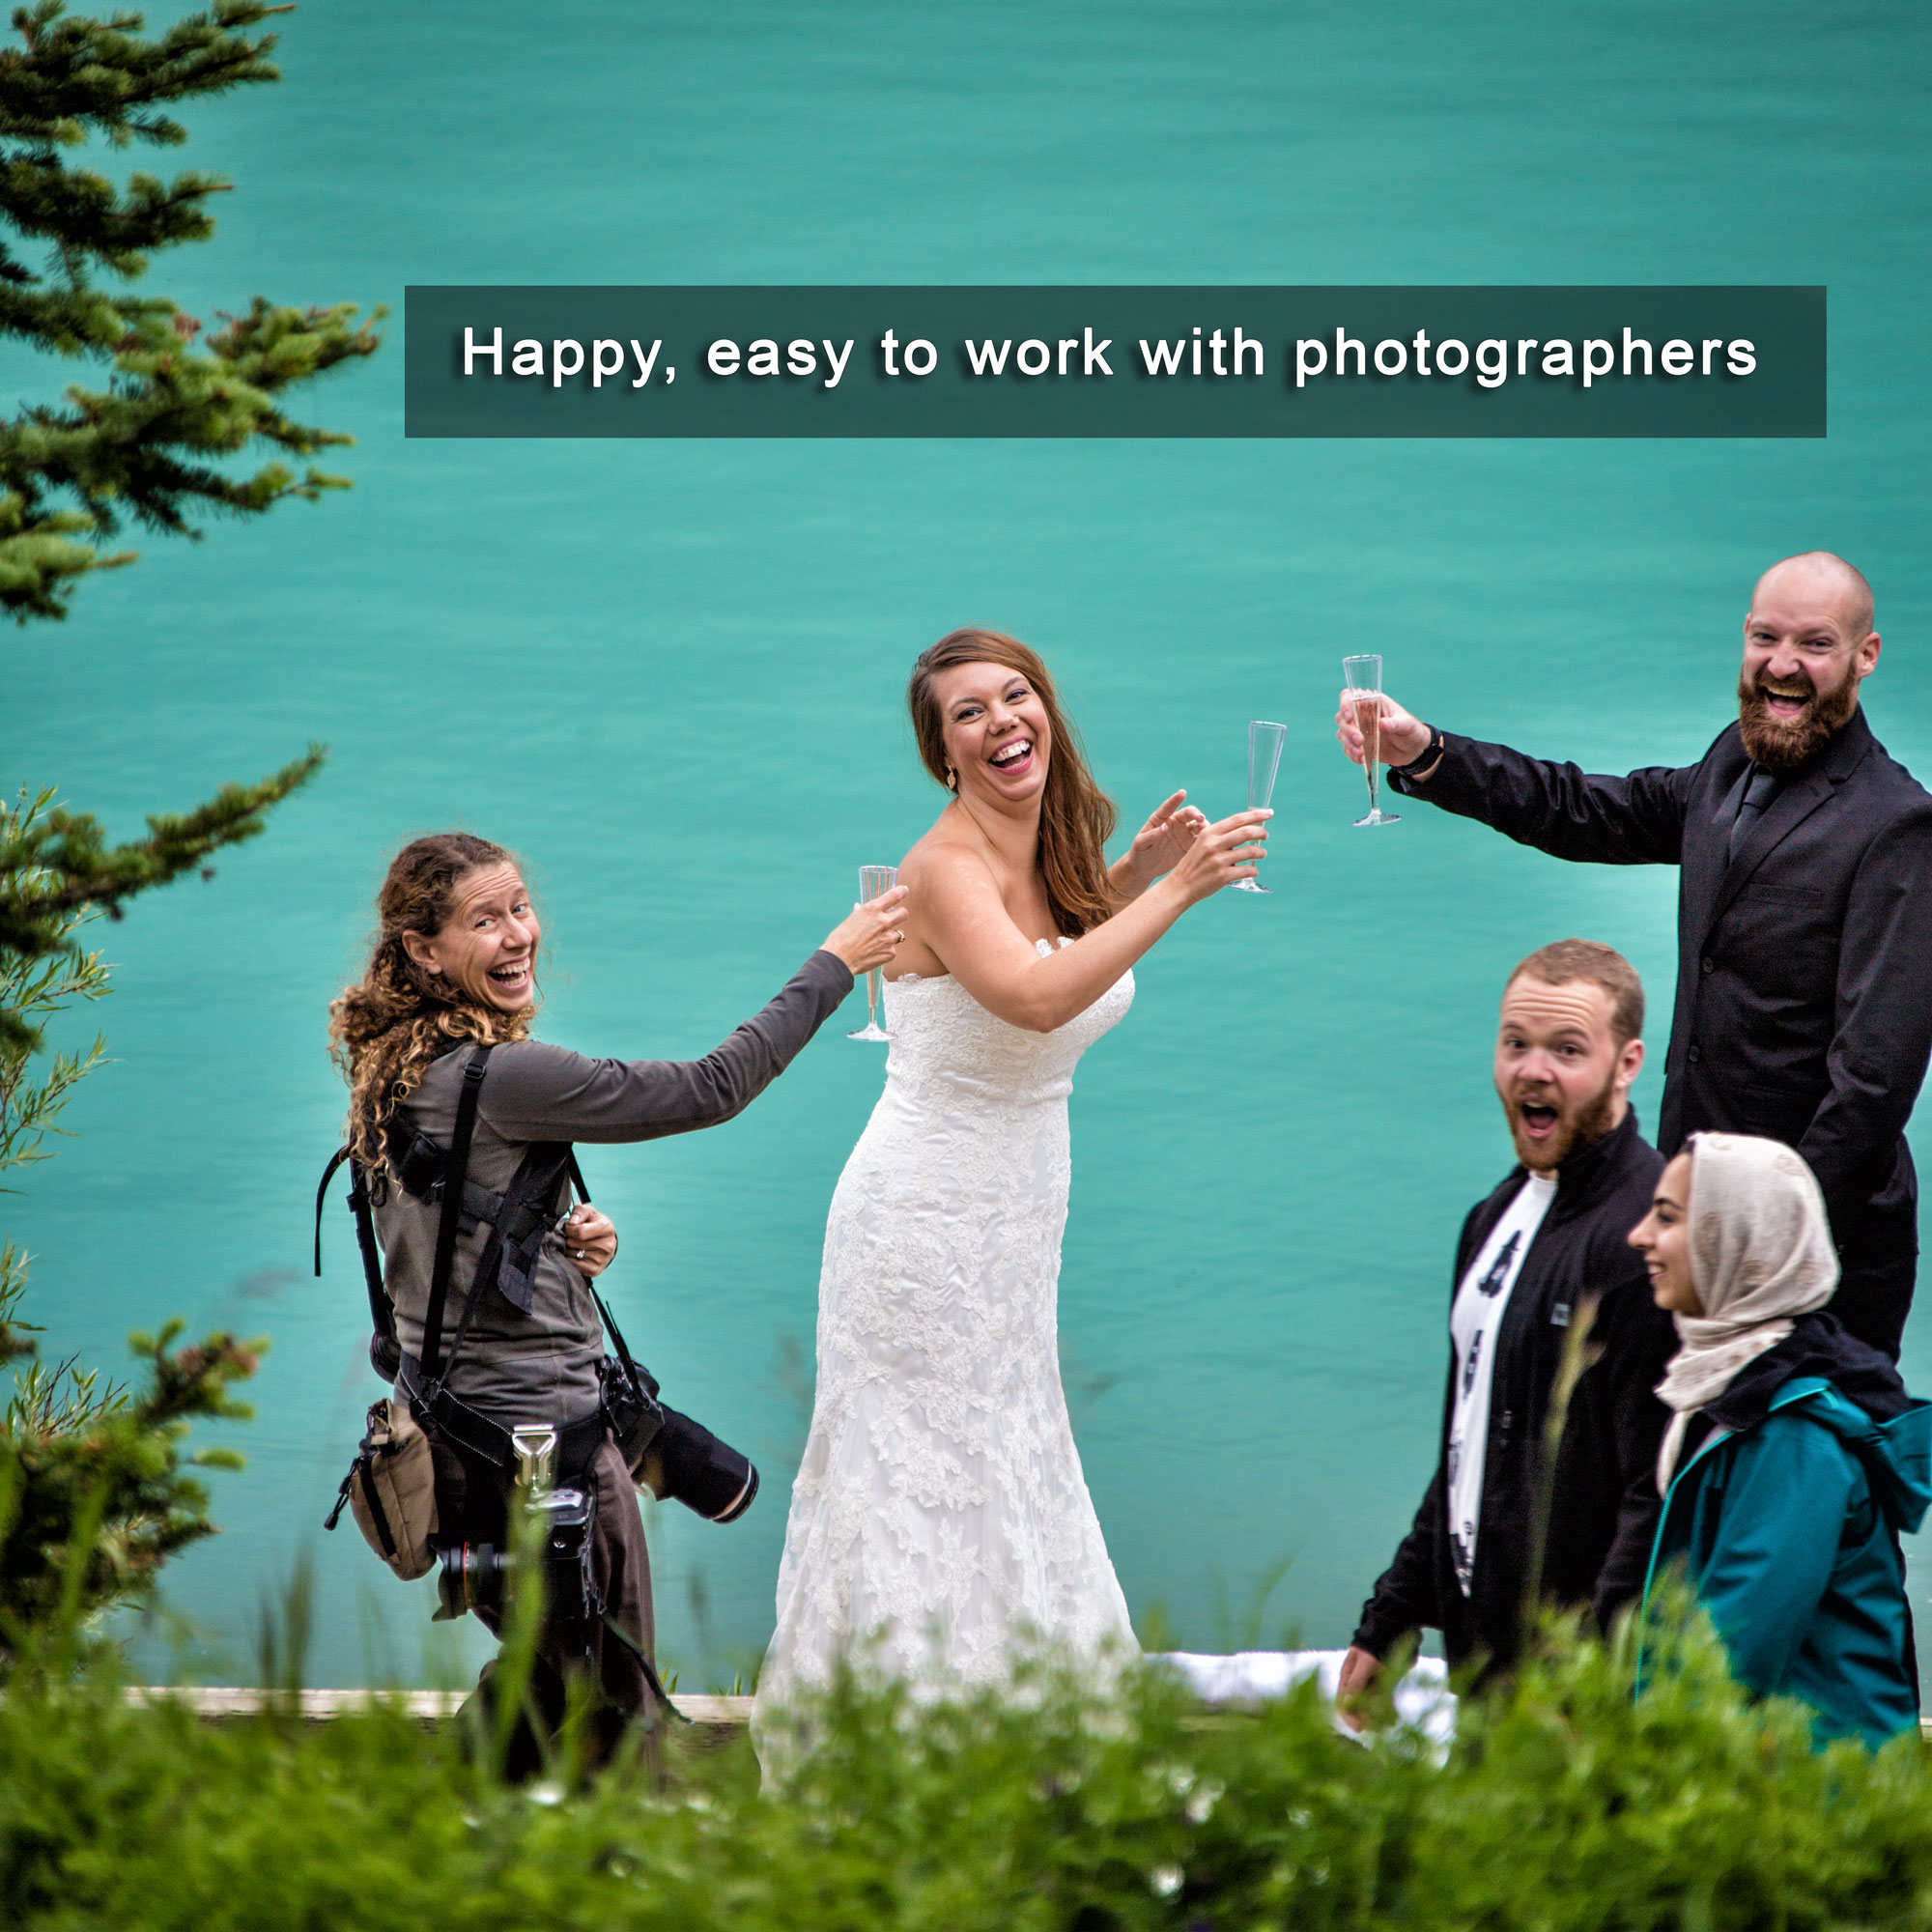 Banff wedding photographer, Shirleen Burnett